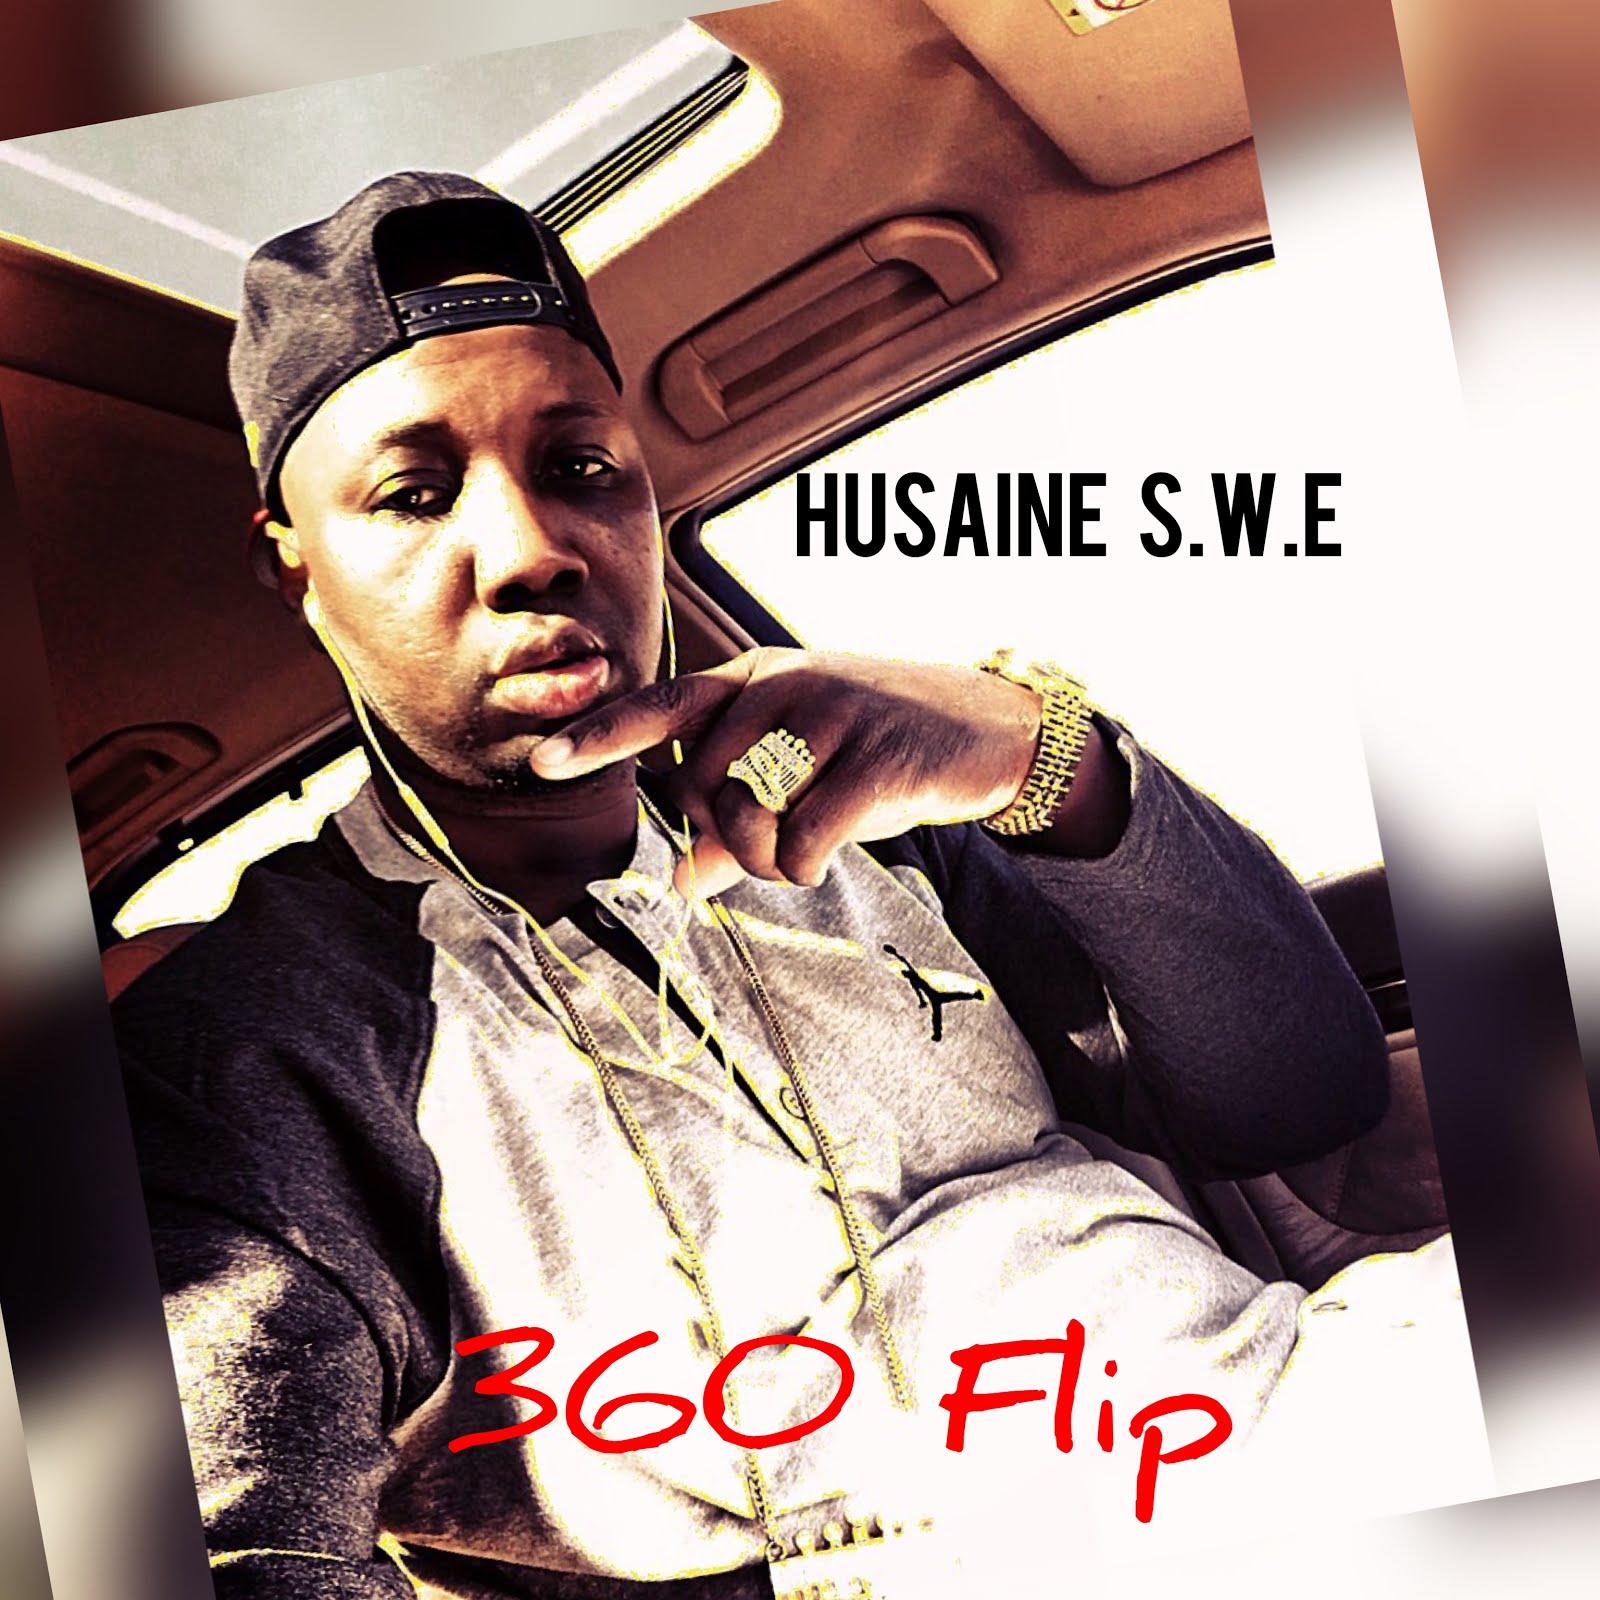 HUSAINE S.W.E